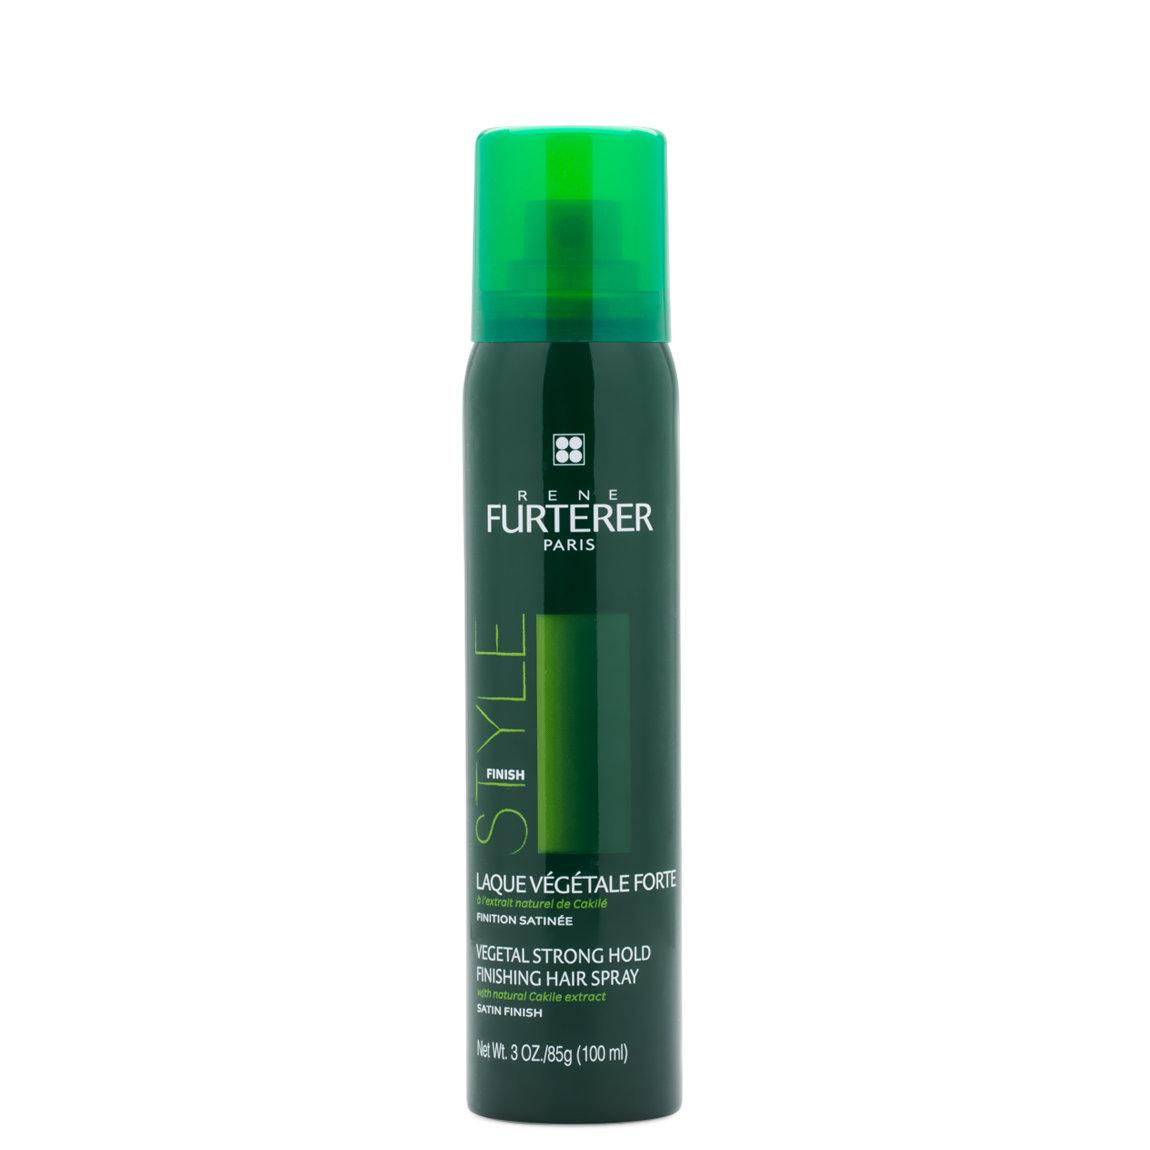 Rene Furterer Style Vegetal Strong Hold Finishing Hair Spray 3 oz product swatch.